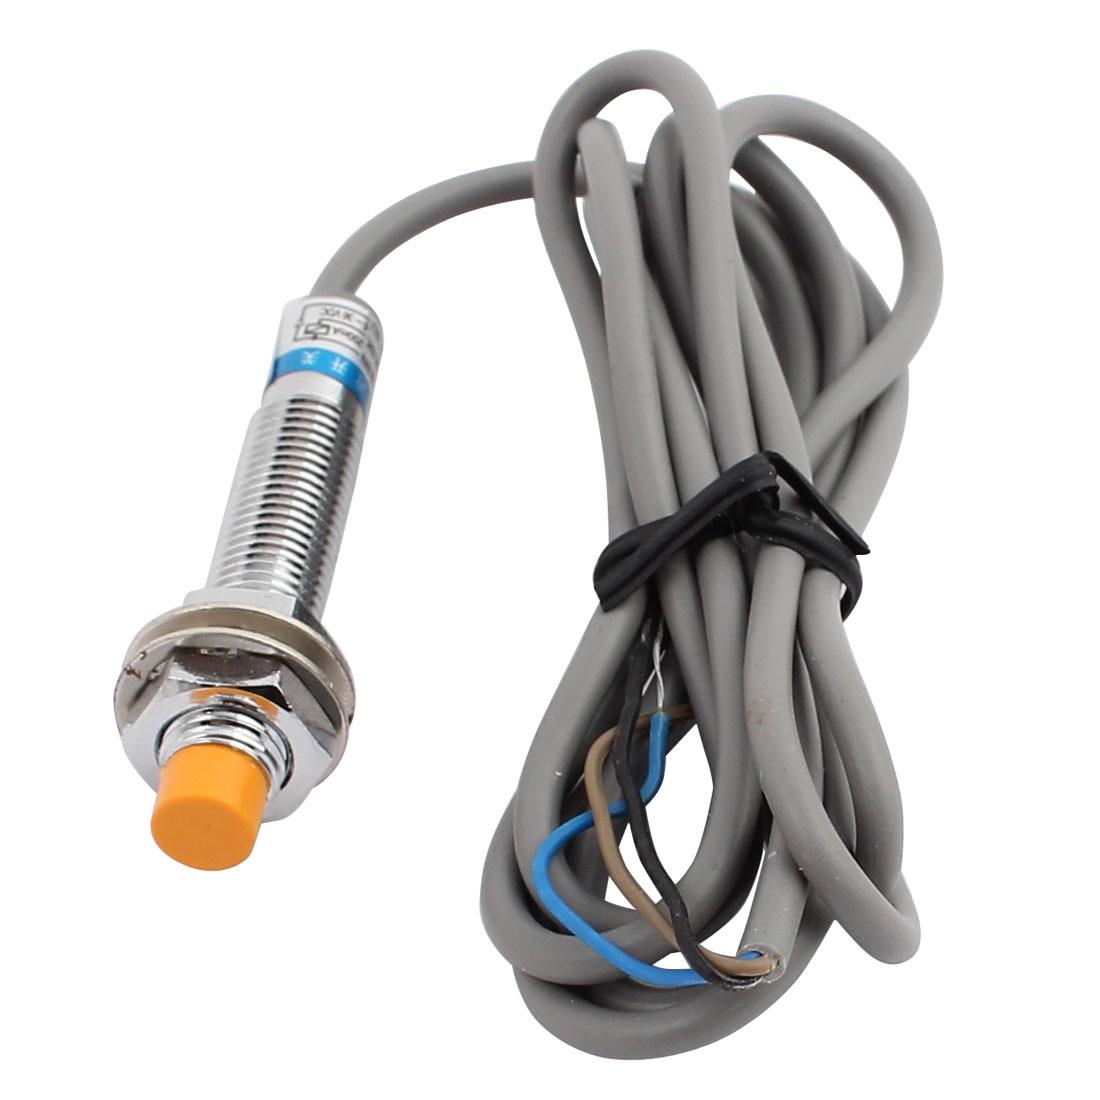 LJ8A3-2-Z/AX DC 6-36V 200mA NPN NC 2mm Inductive Proximity Sensor Switch 3-wire